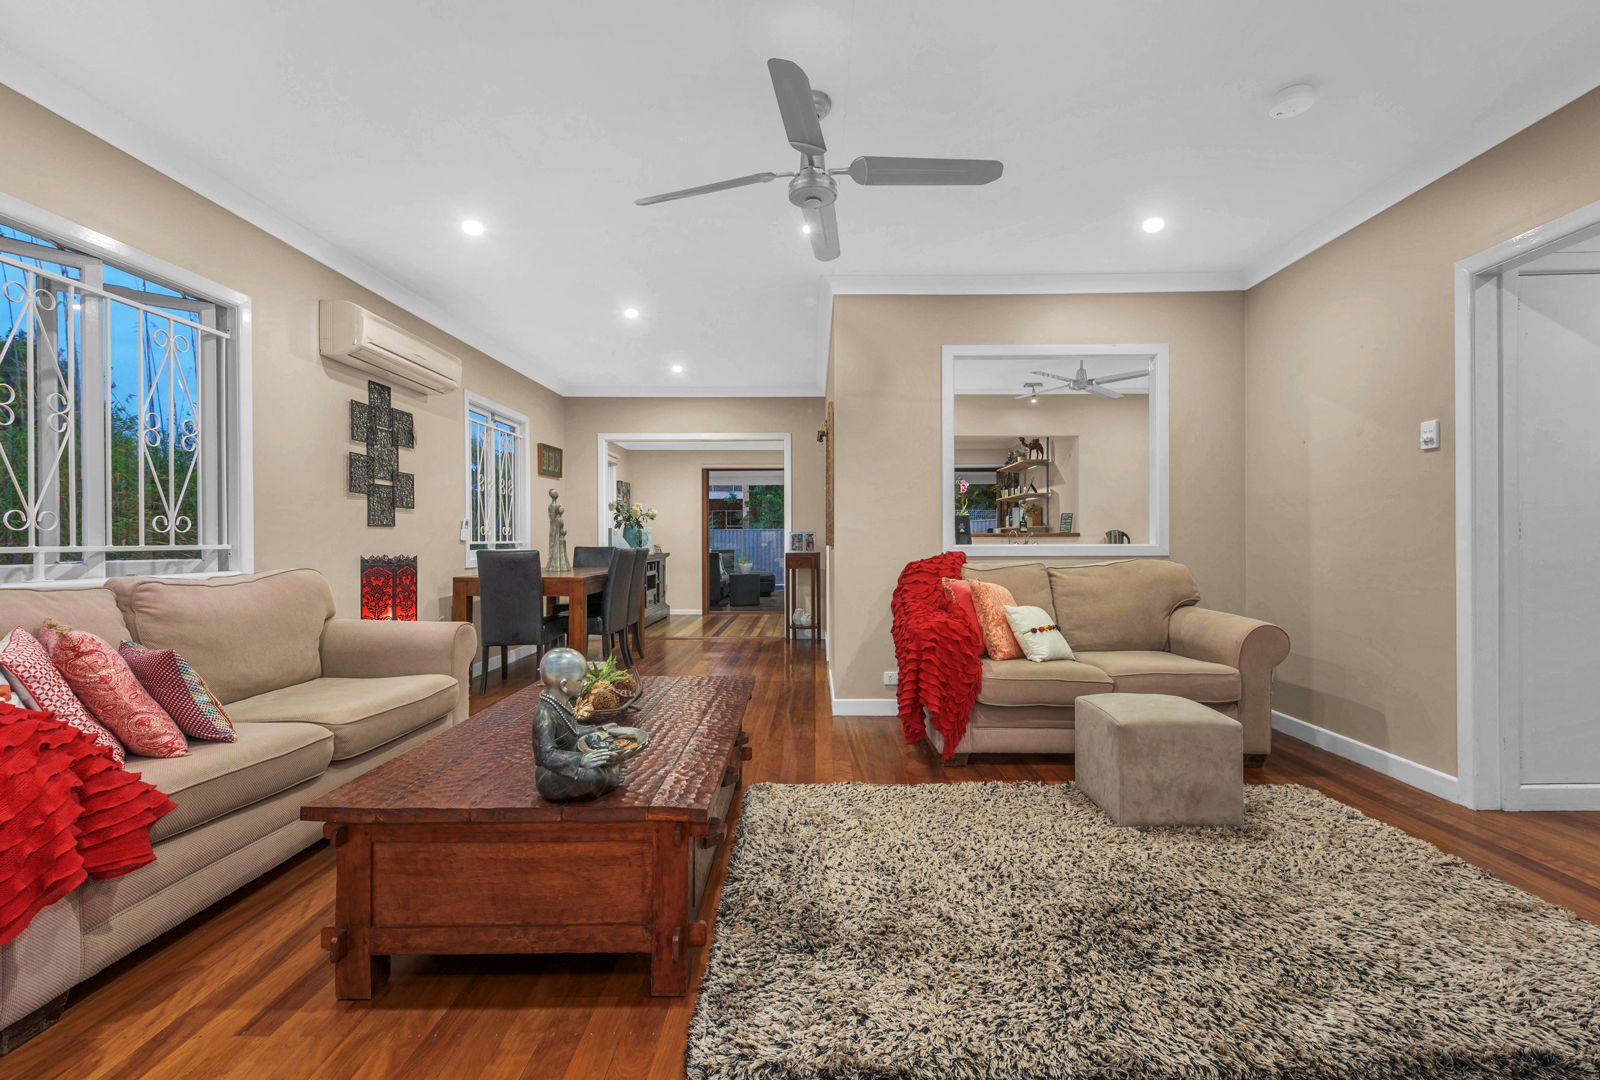 54 Merle Street, Carina QLD 4152, Image 2